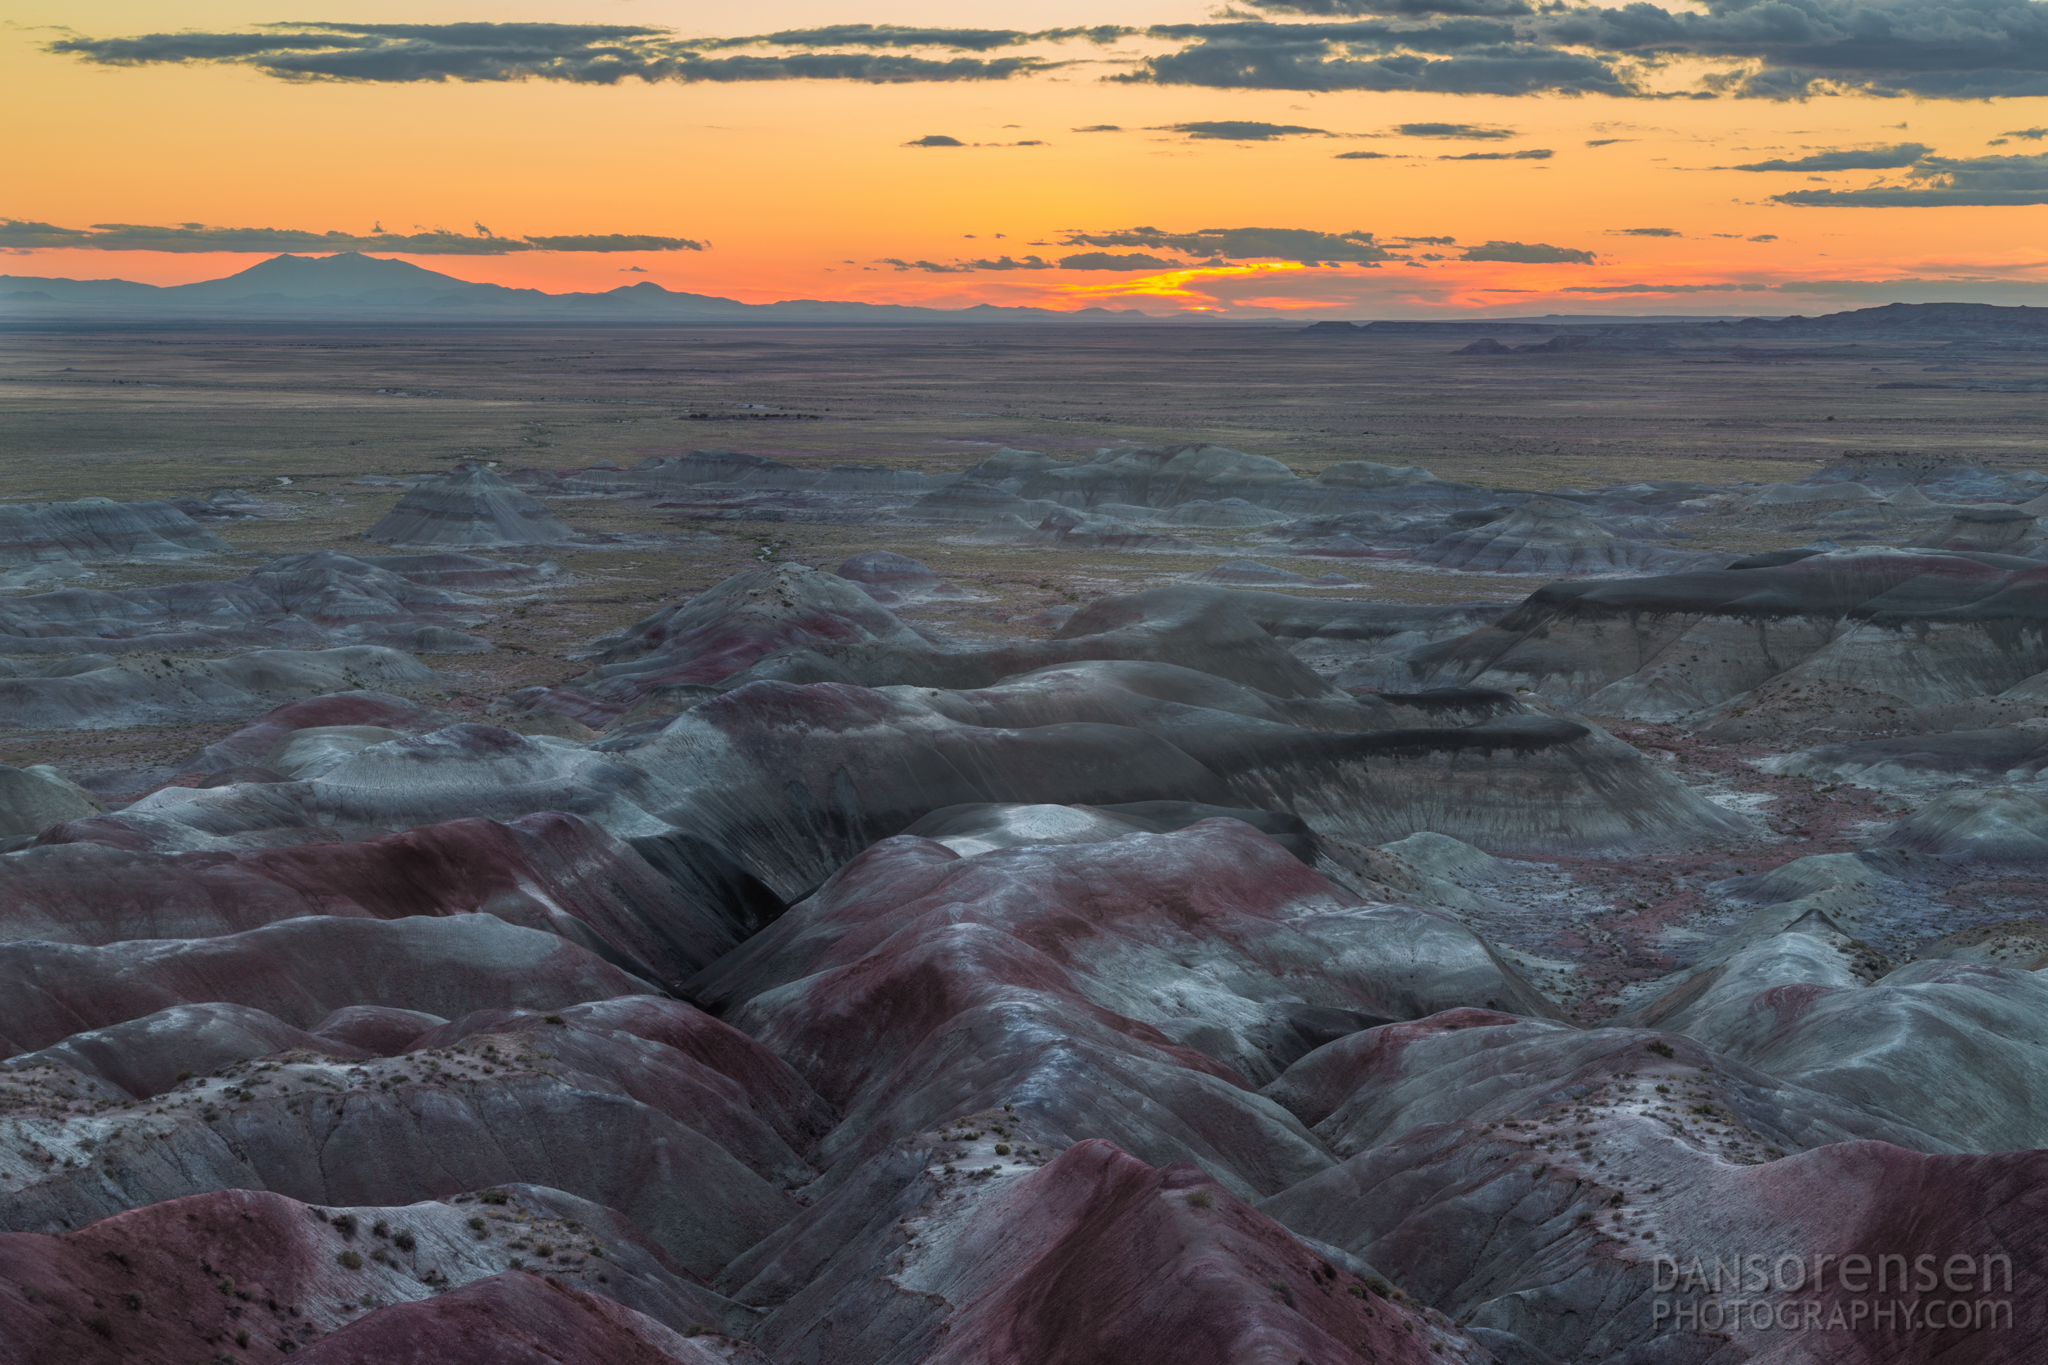 Sunset in the Little Painted Desert